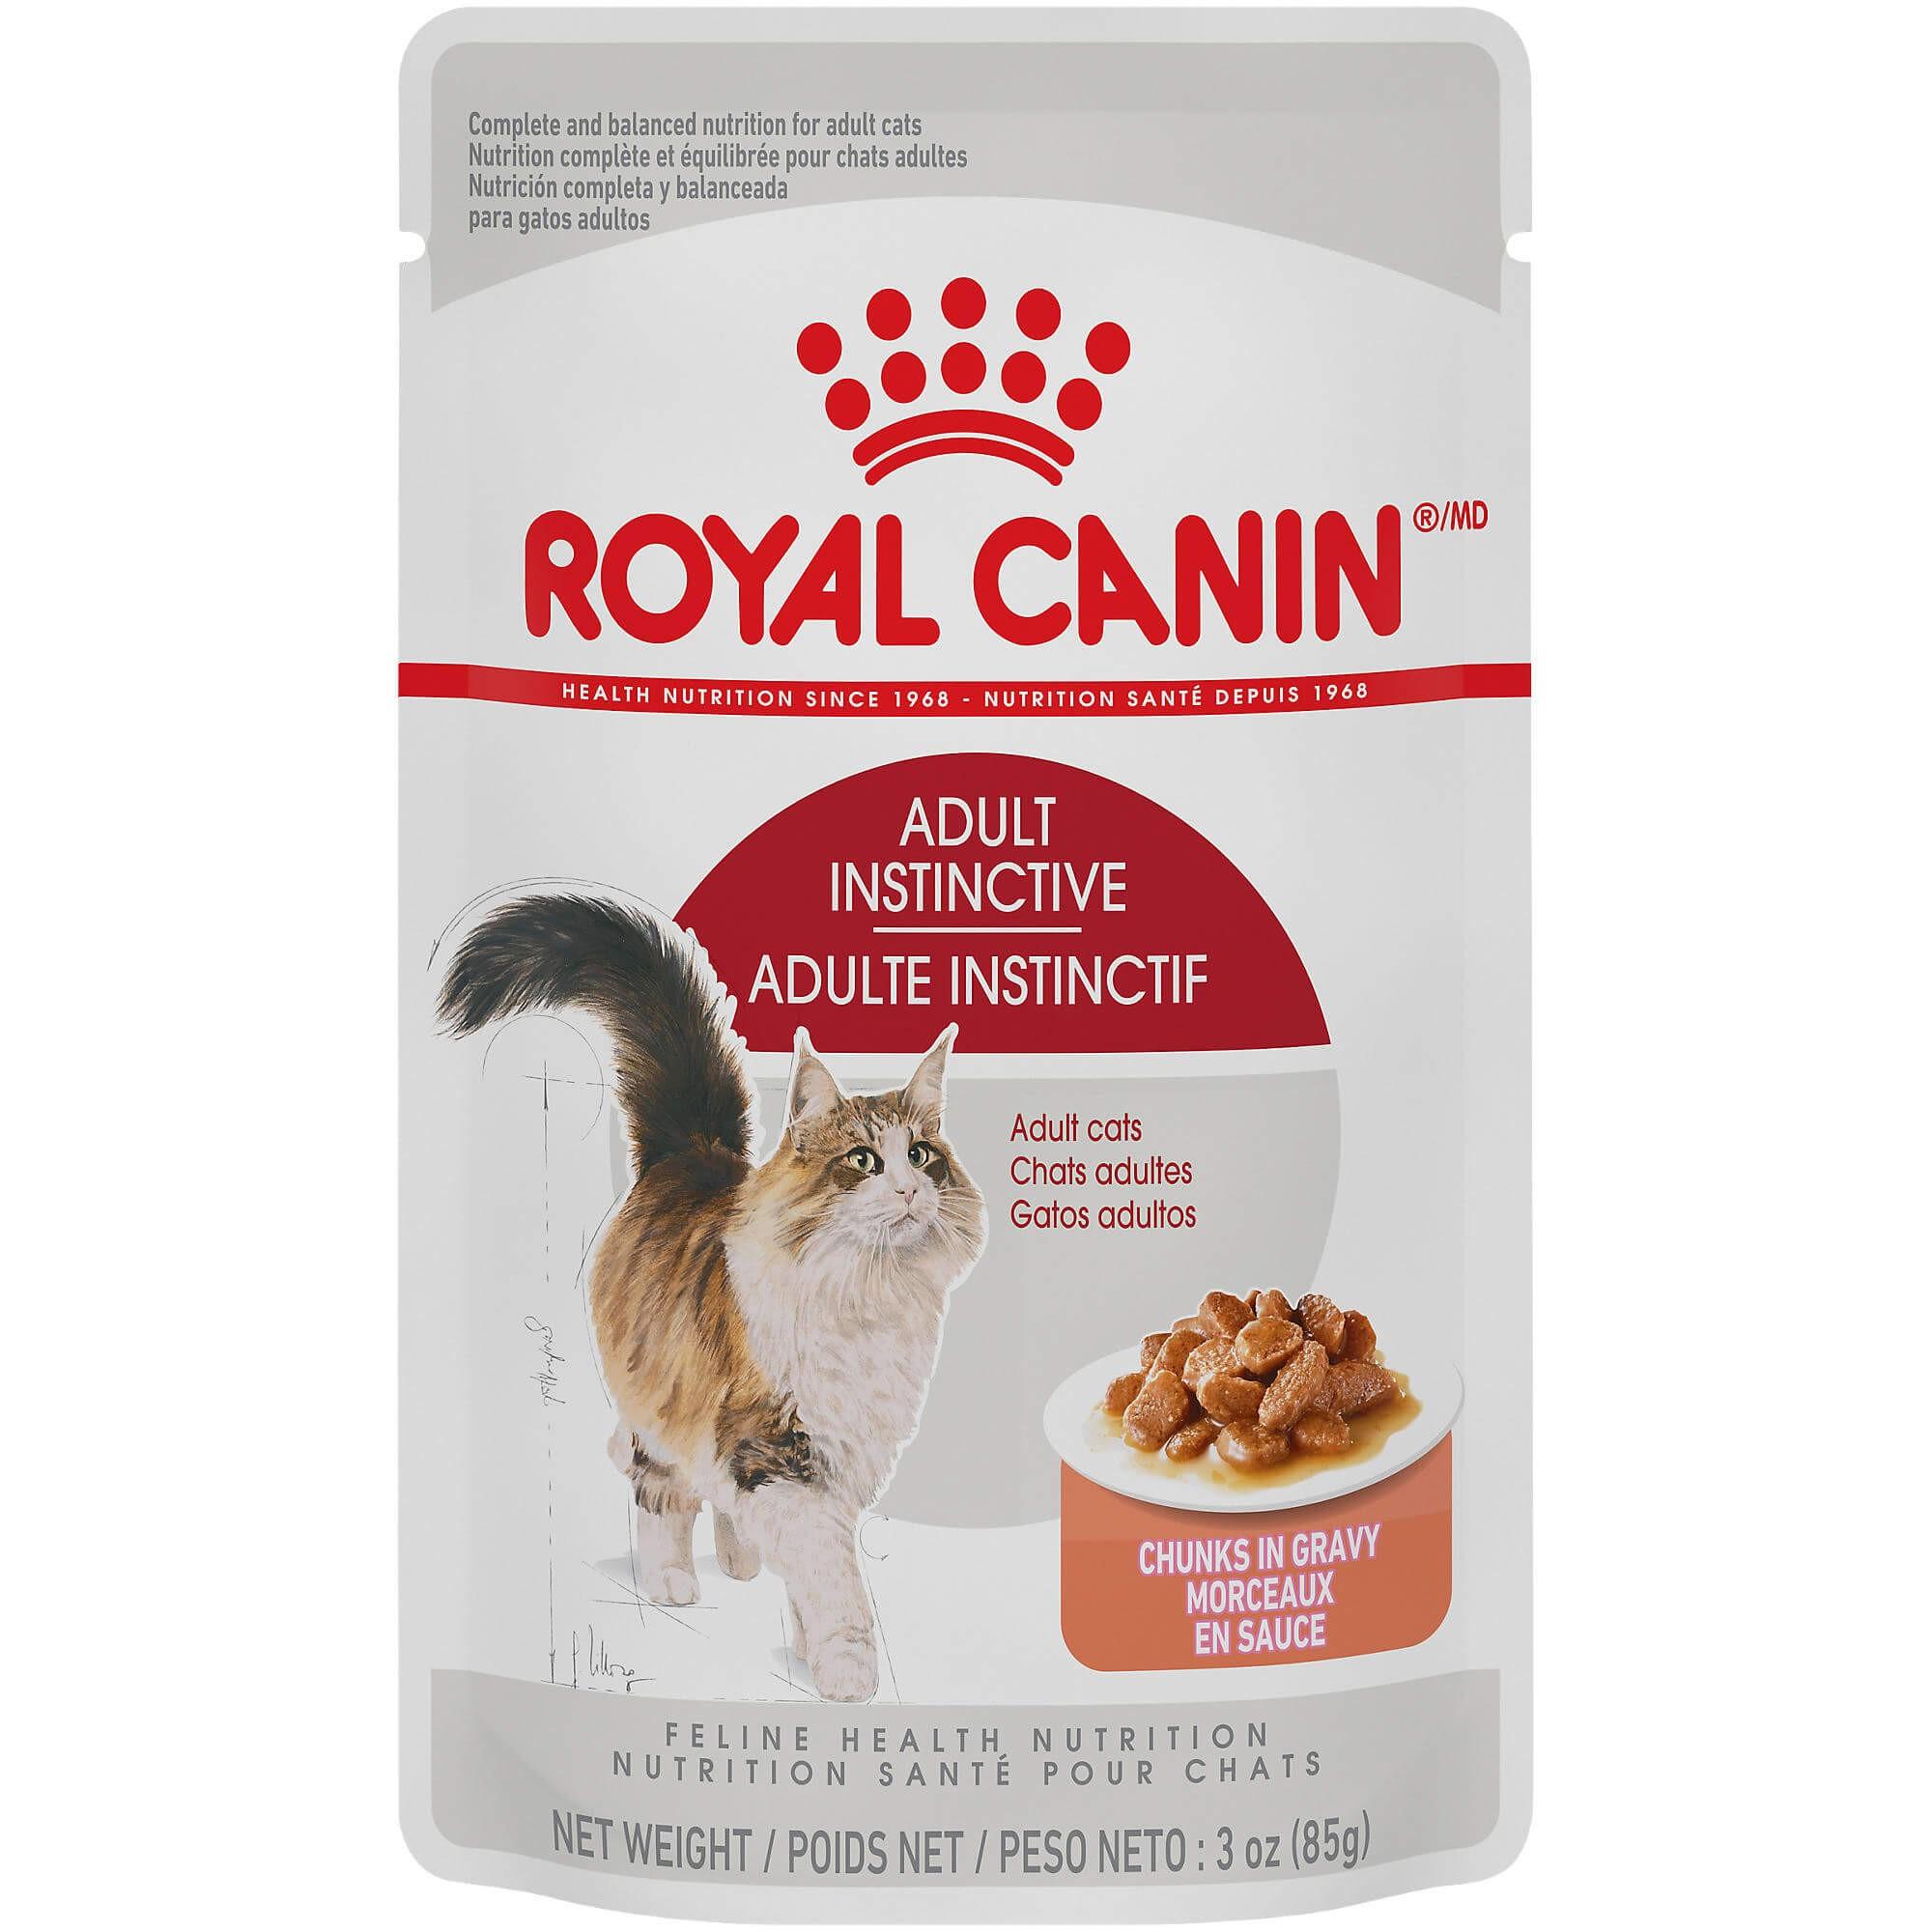 Pate Cho Mèo Royal Canin Instinctive Gravy